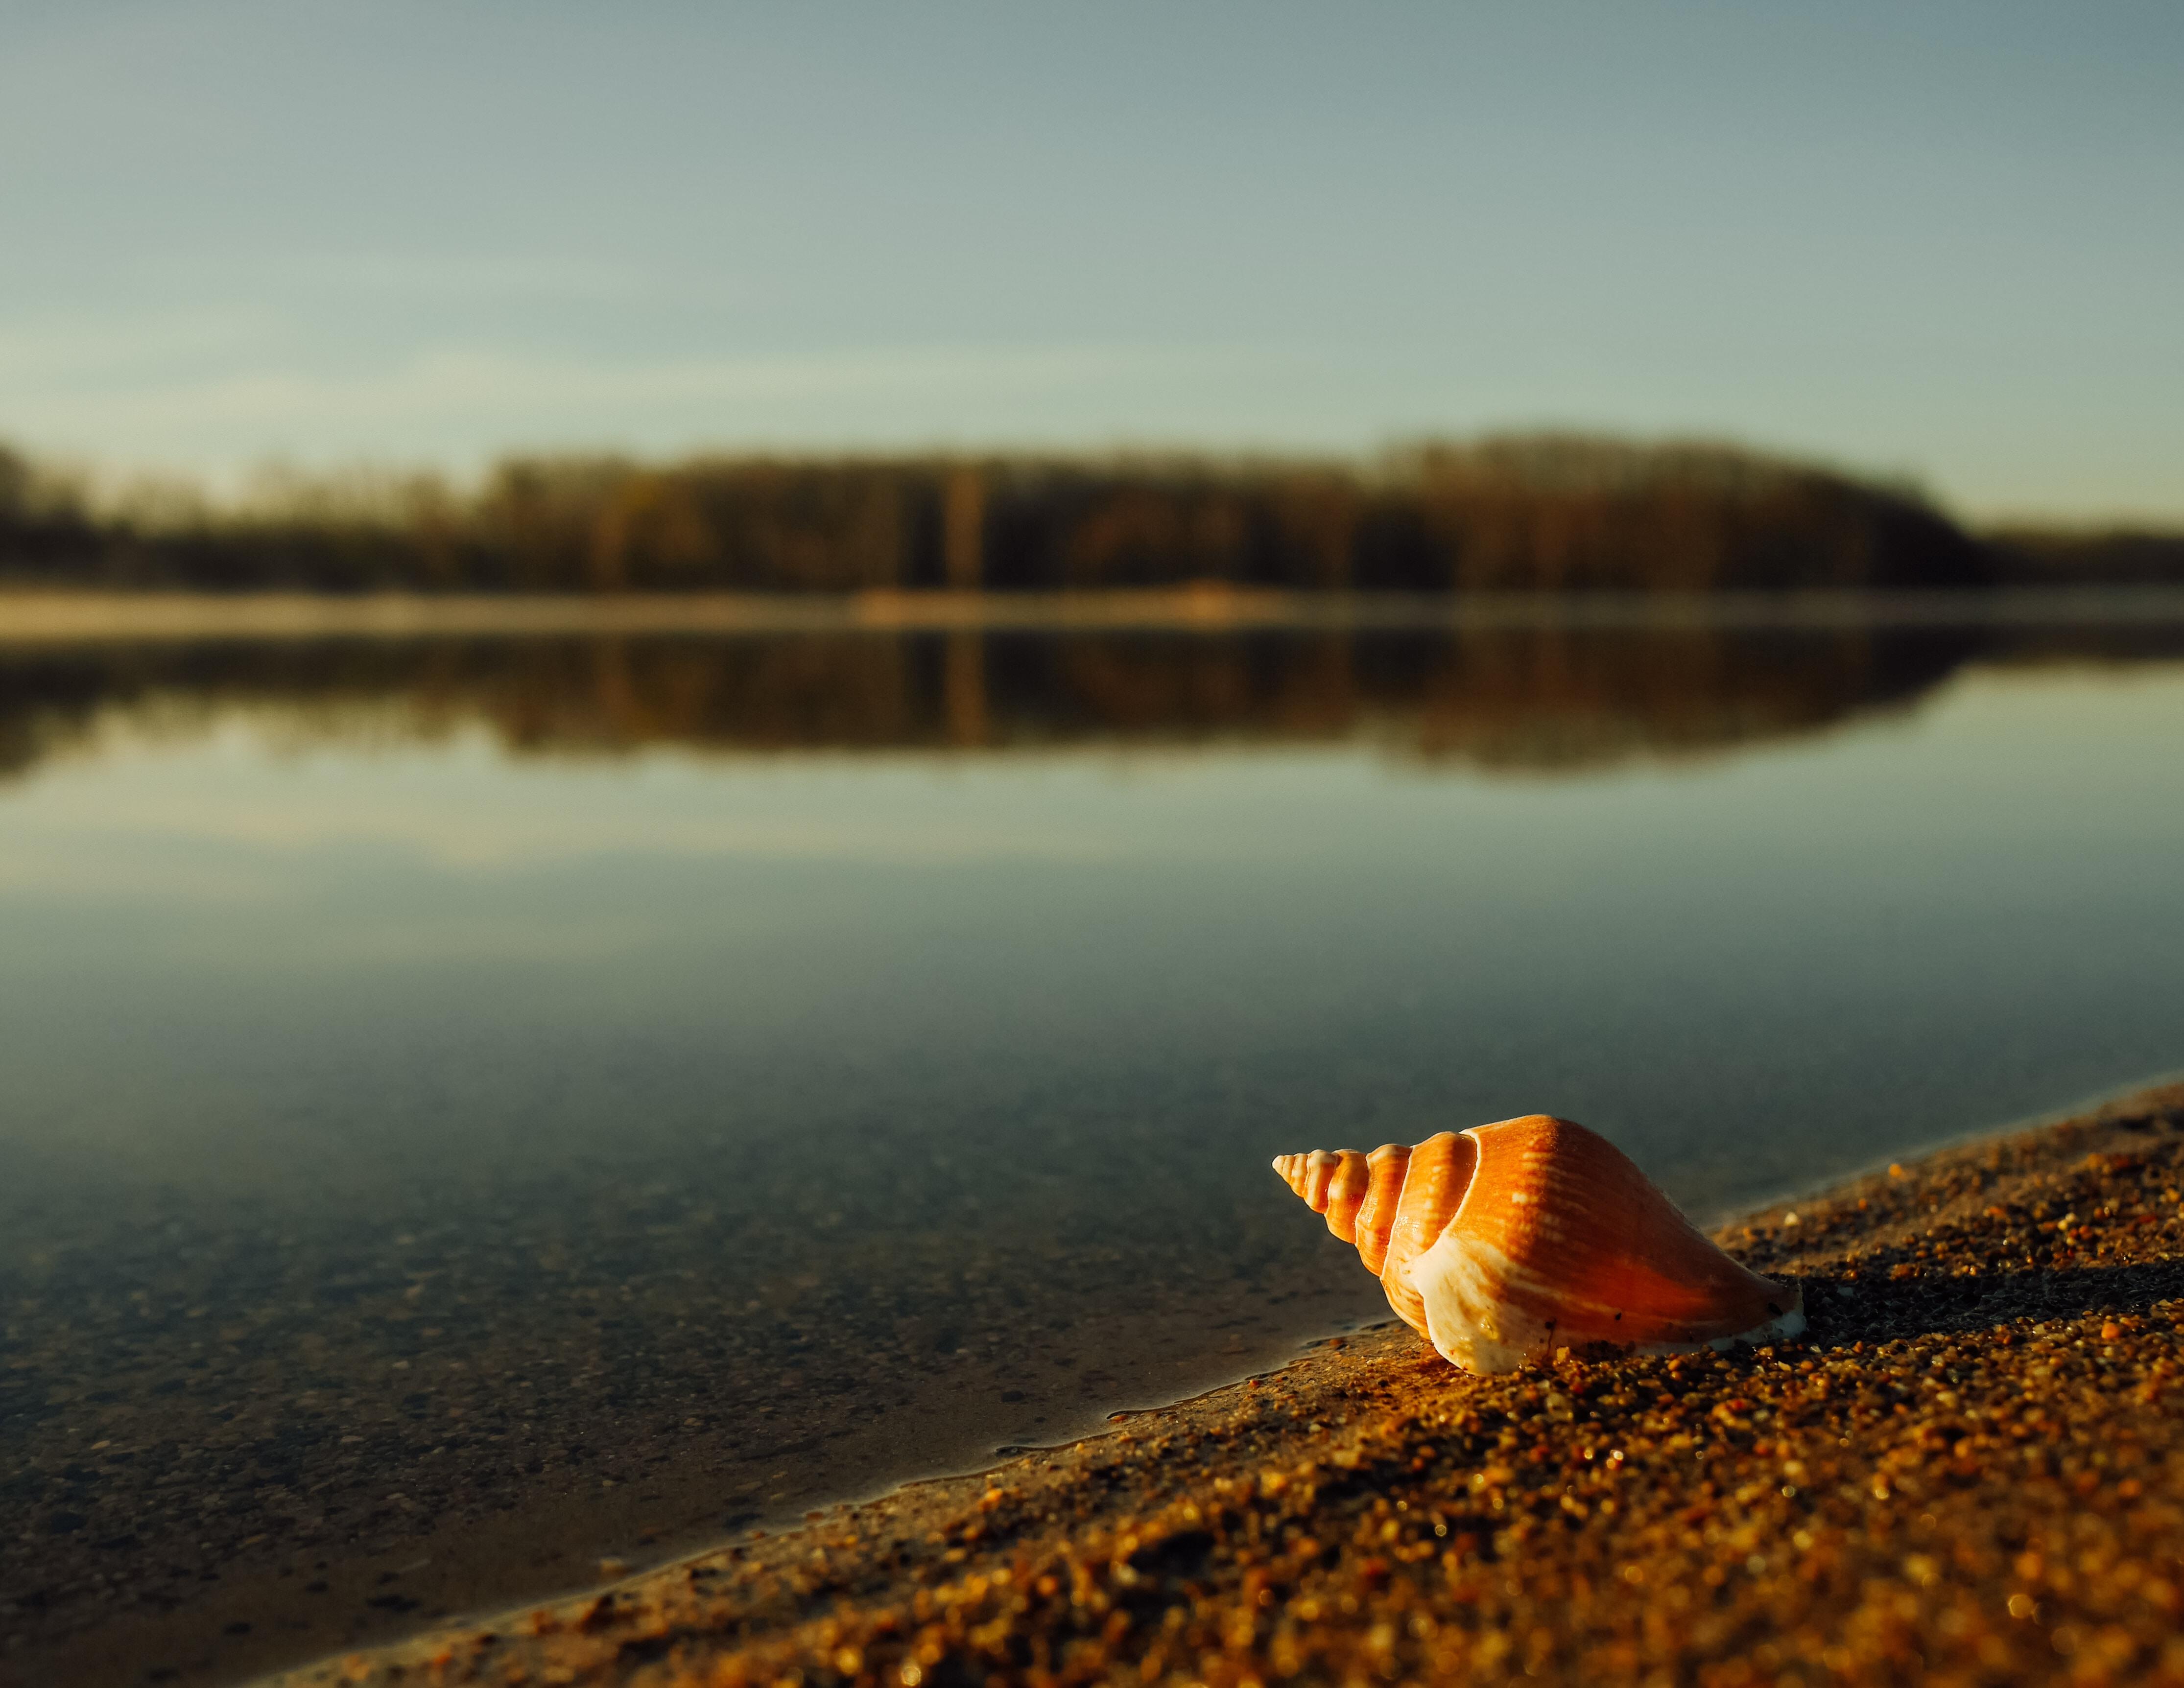 Shell macro shot at the sand coastline